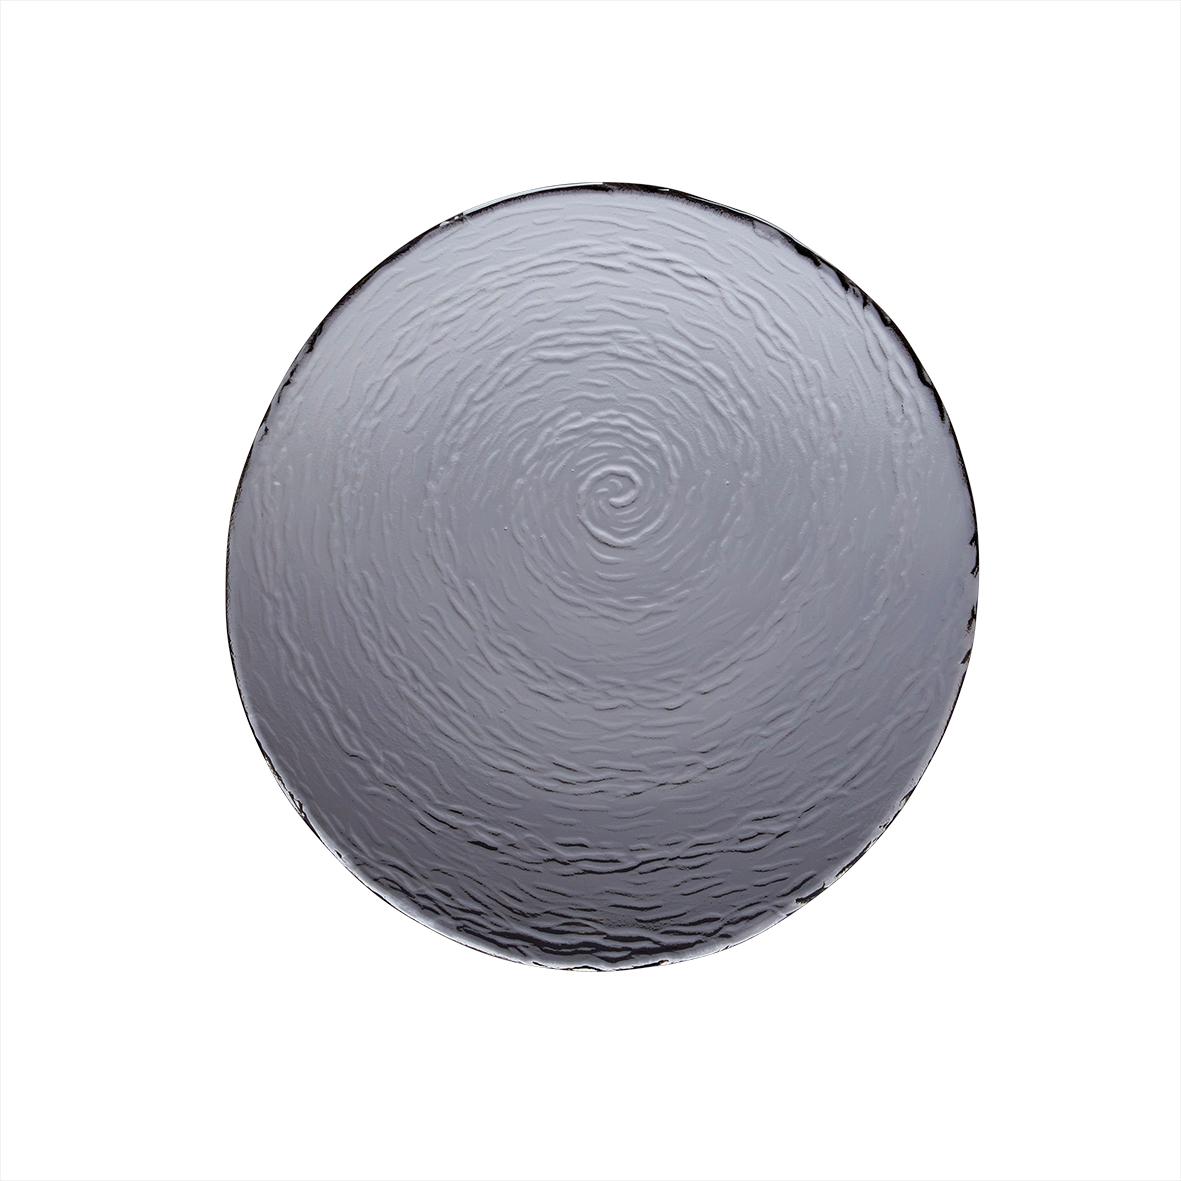 Онлайн каталог PROMENU: Тарелка сервировочная/подстановочная Steelite Scape Glass Smoked, 30 см                               6513G380